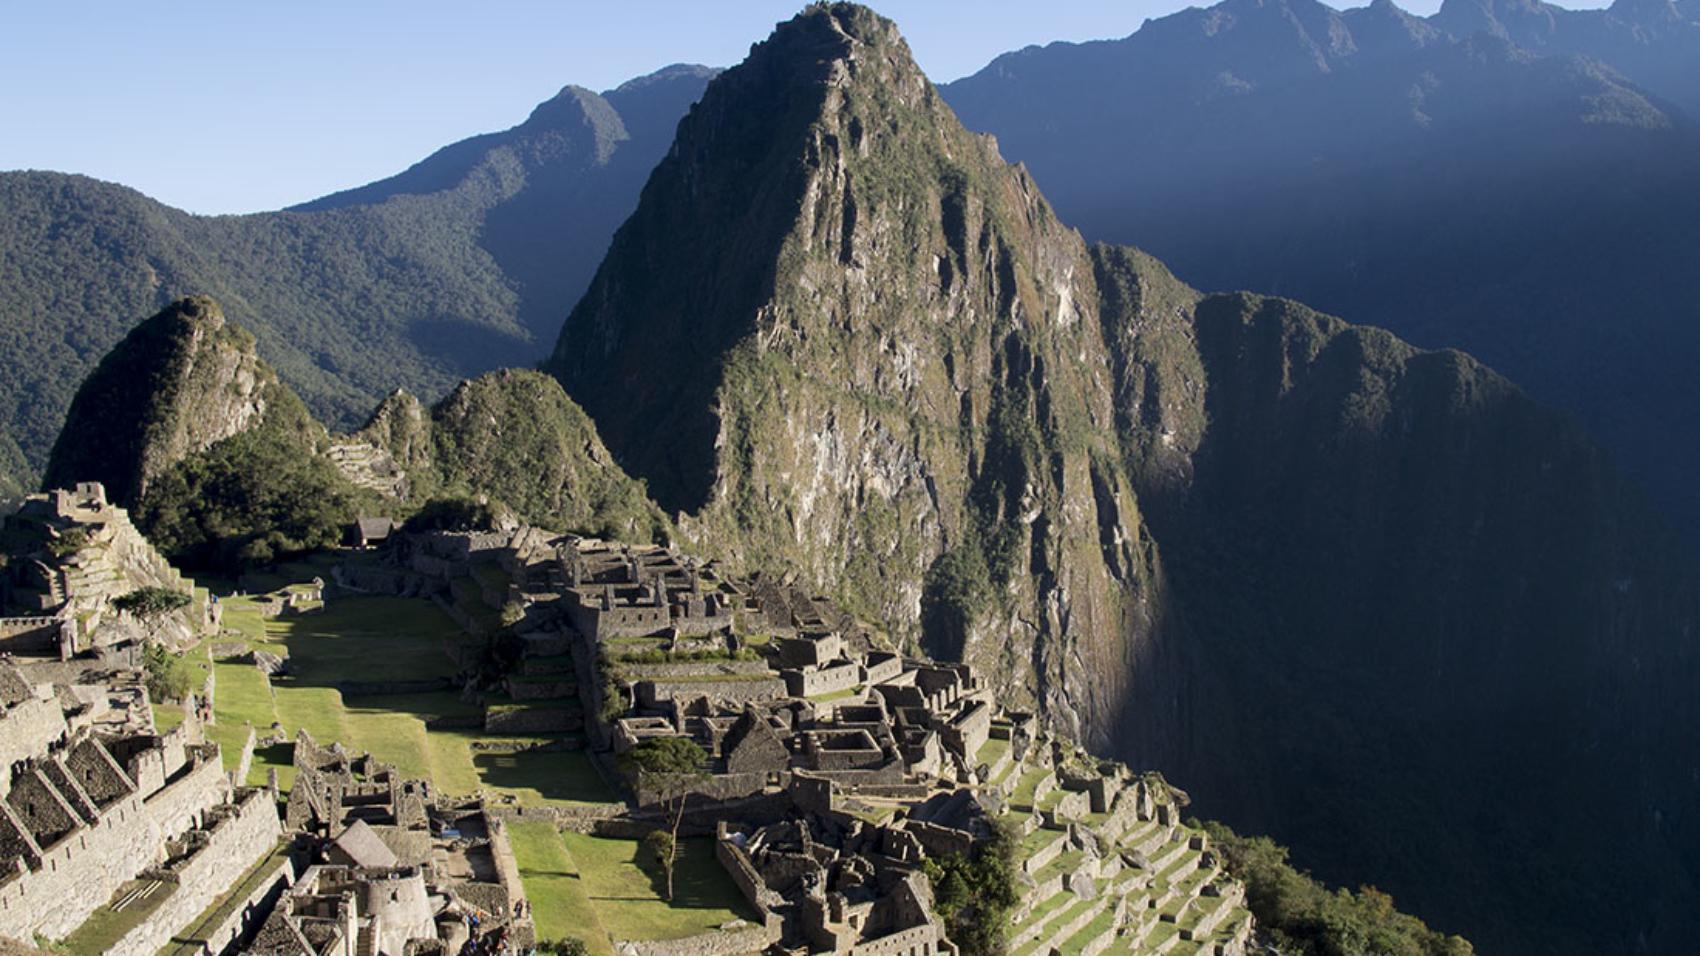 overlooking Machu Picchu at sunrise